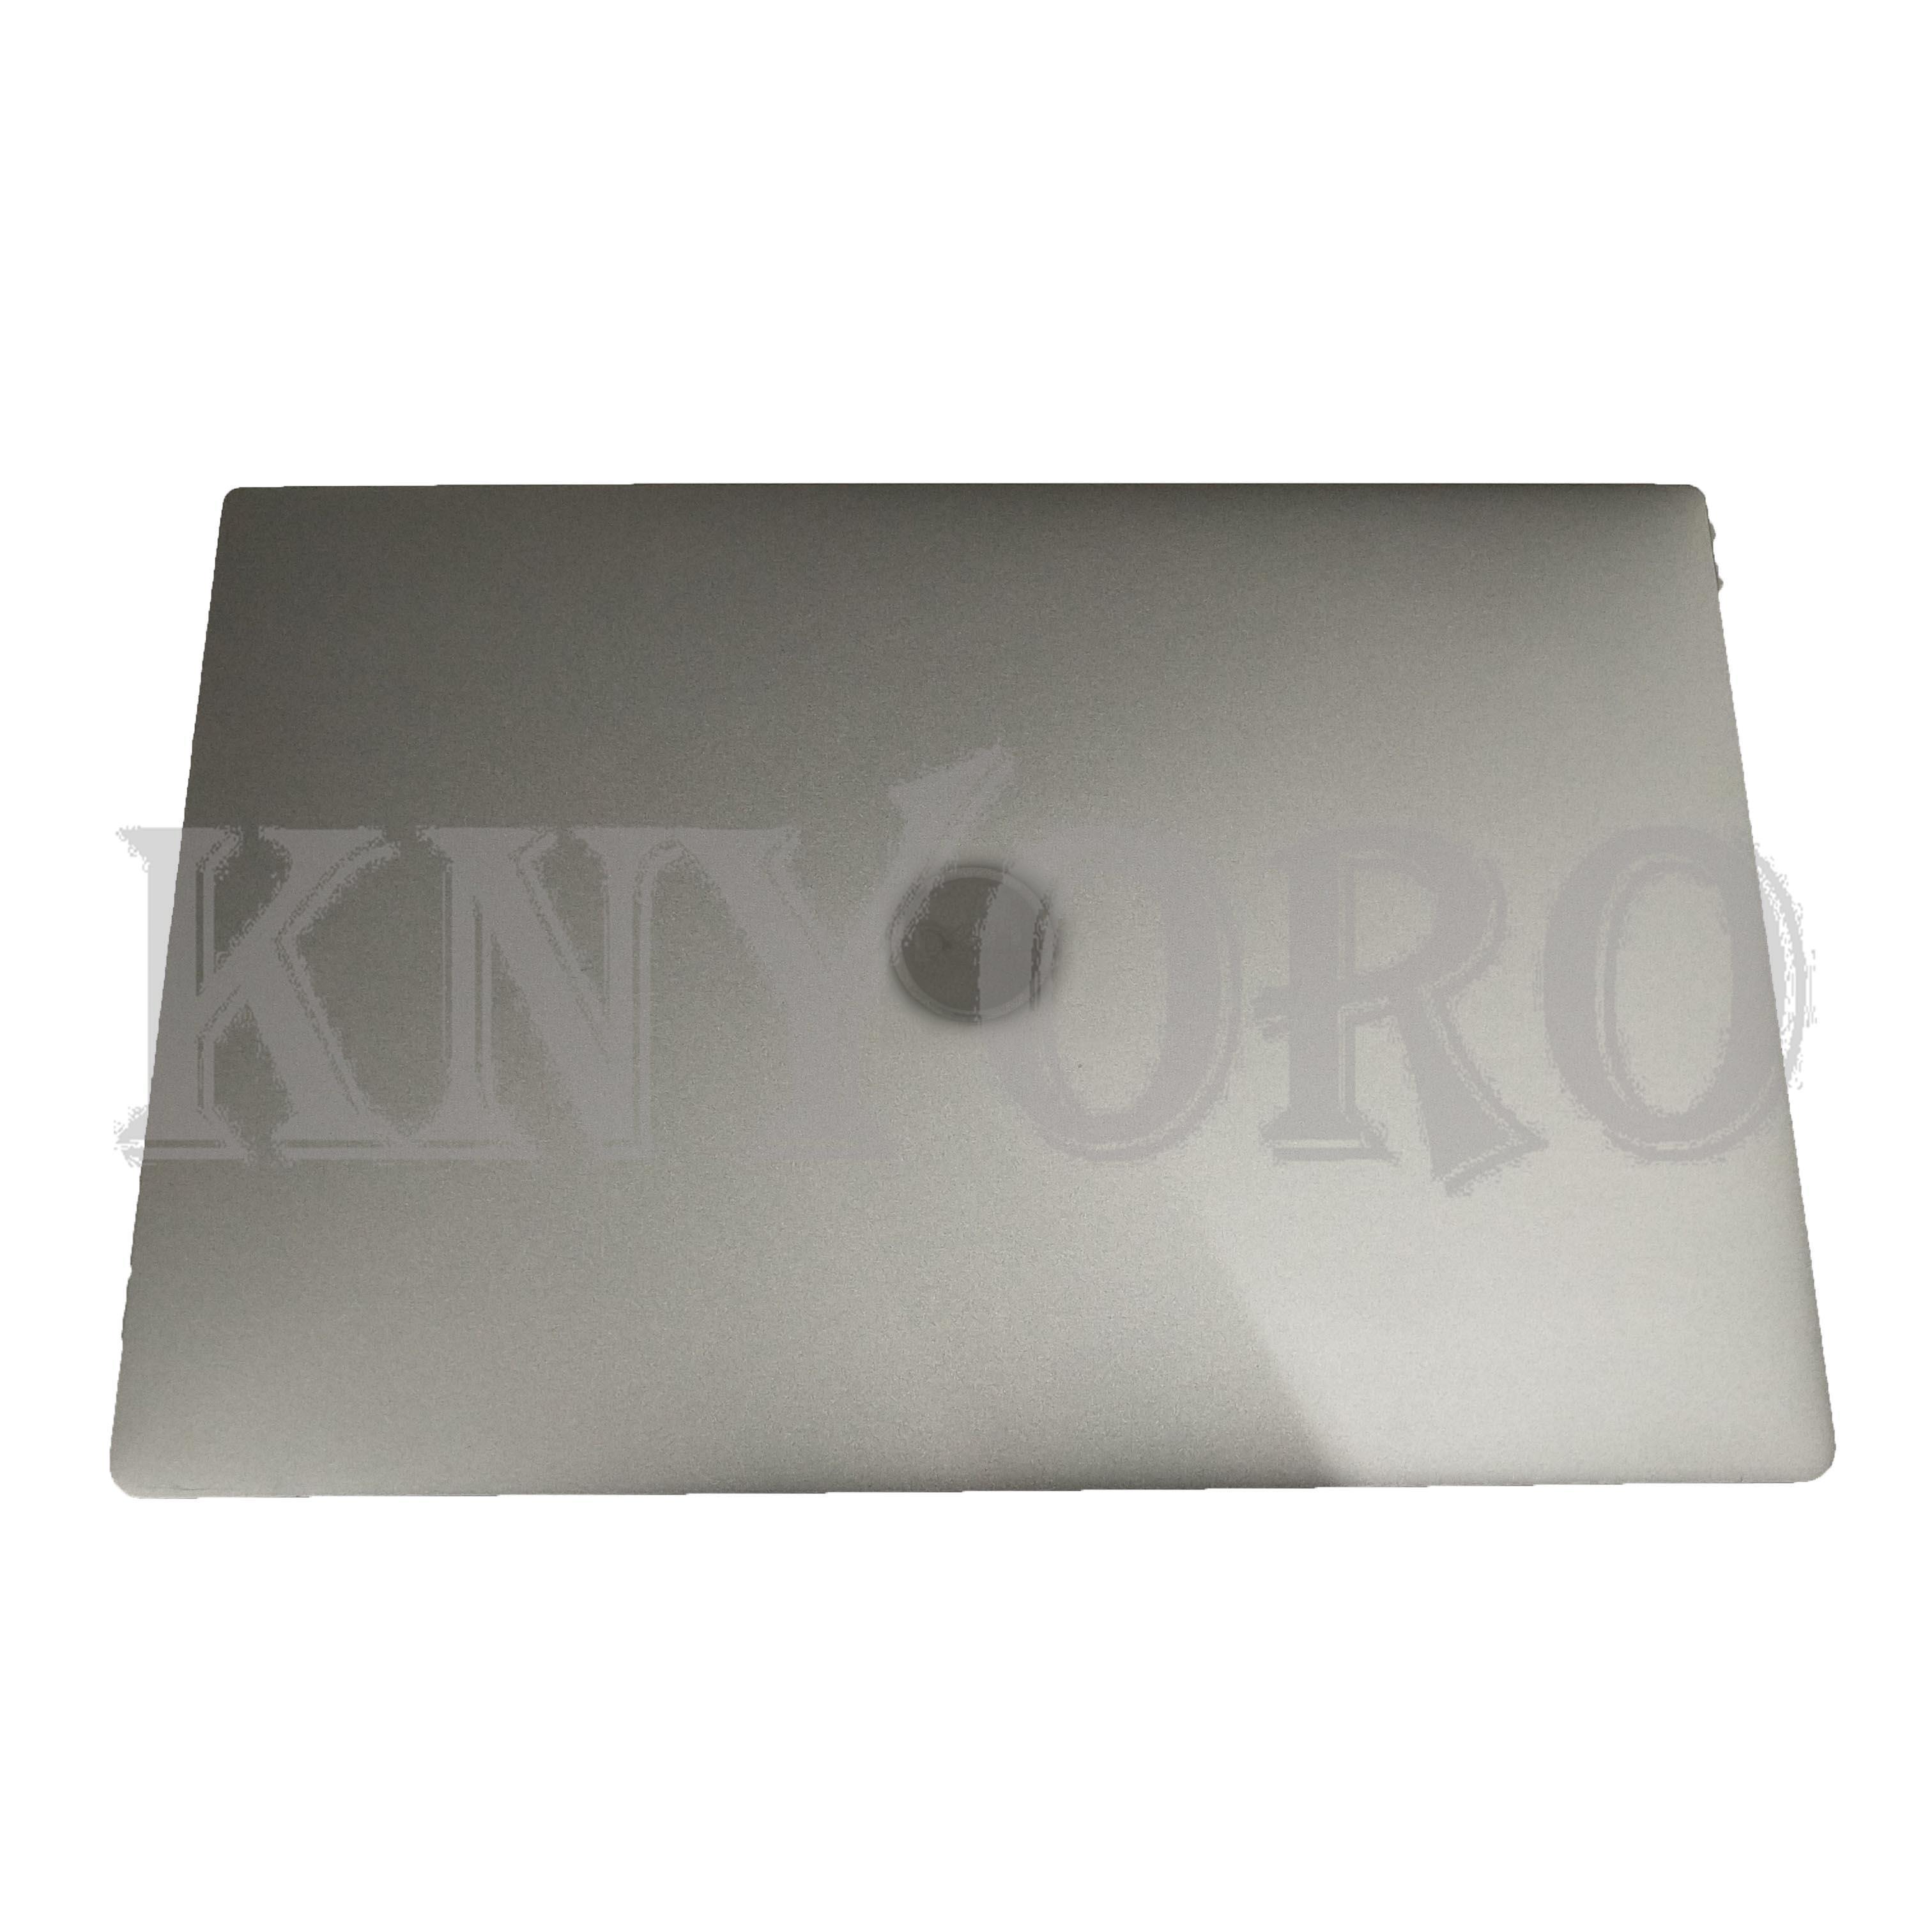 Nuevo LCD original tapa trasera LCD cubierta superior plata blanca una carcasa...